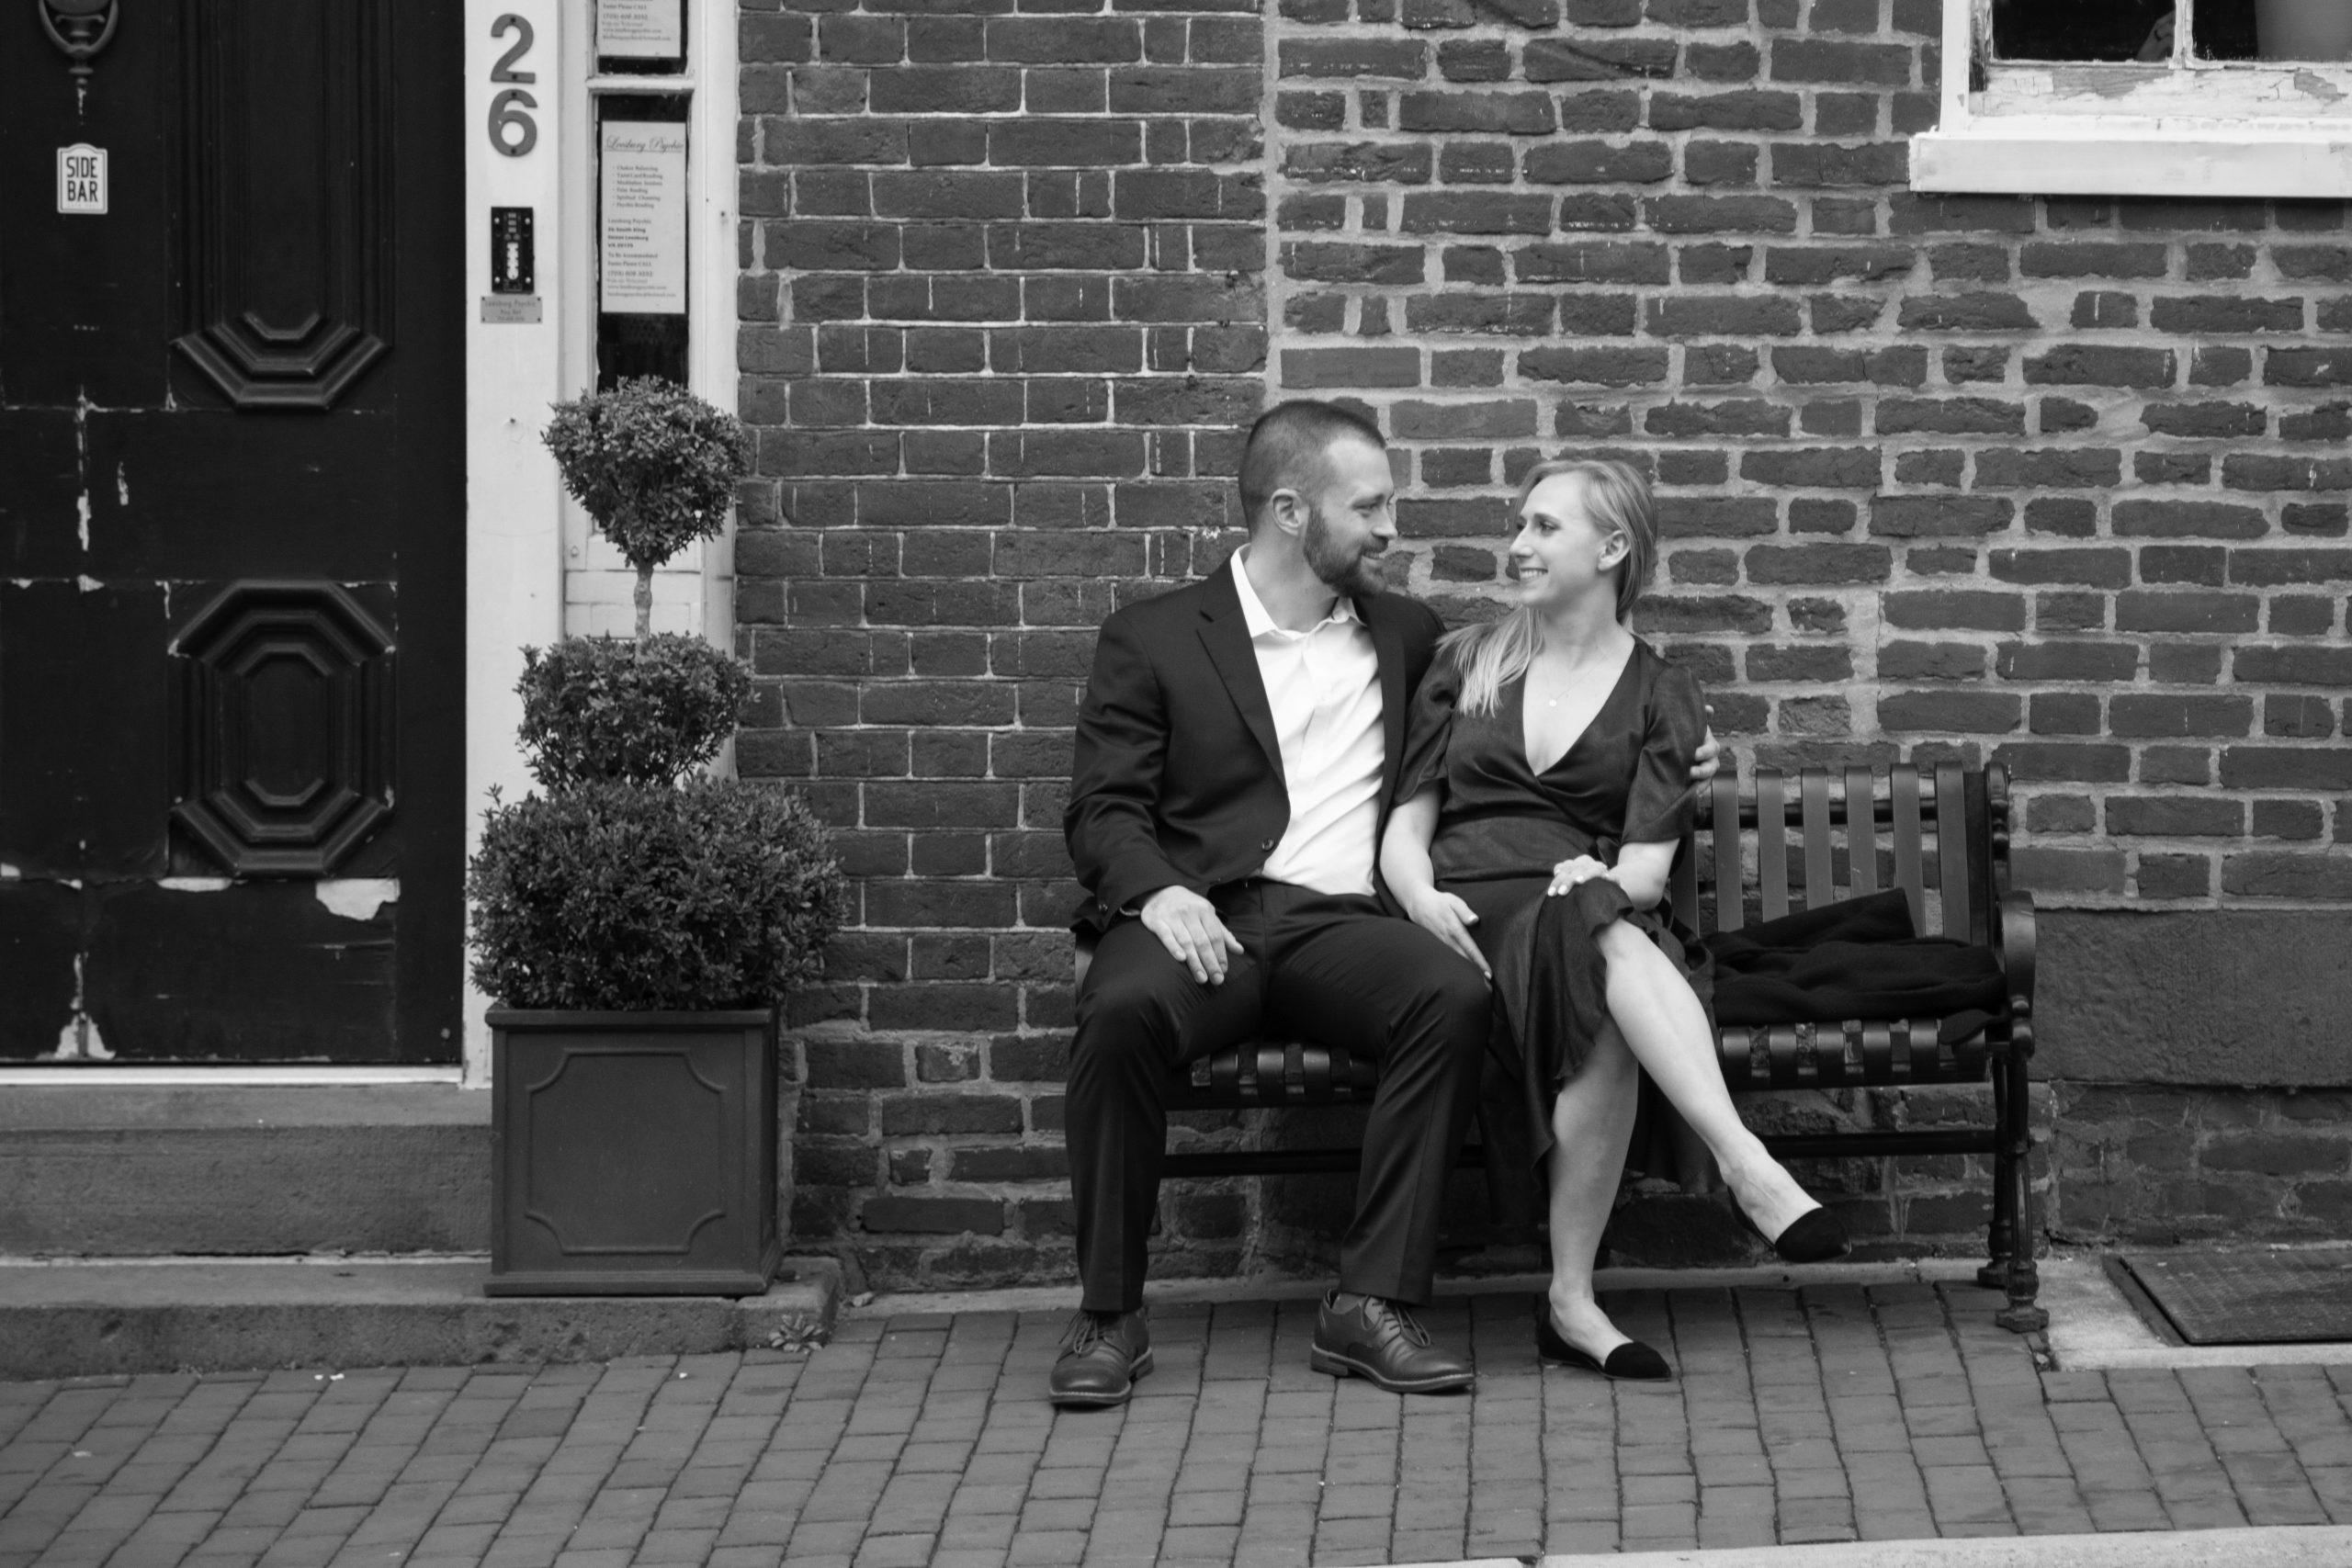 Leesburg Virginia Engagement Photography: Maggie & Nick in Downtown Leesburg.